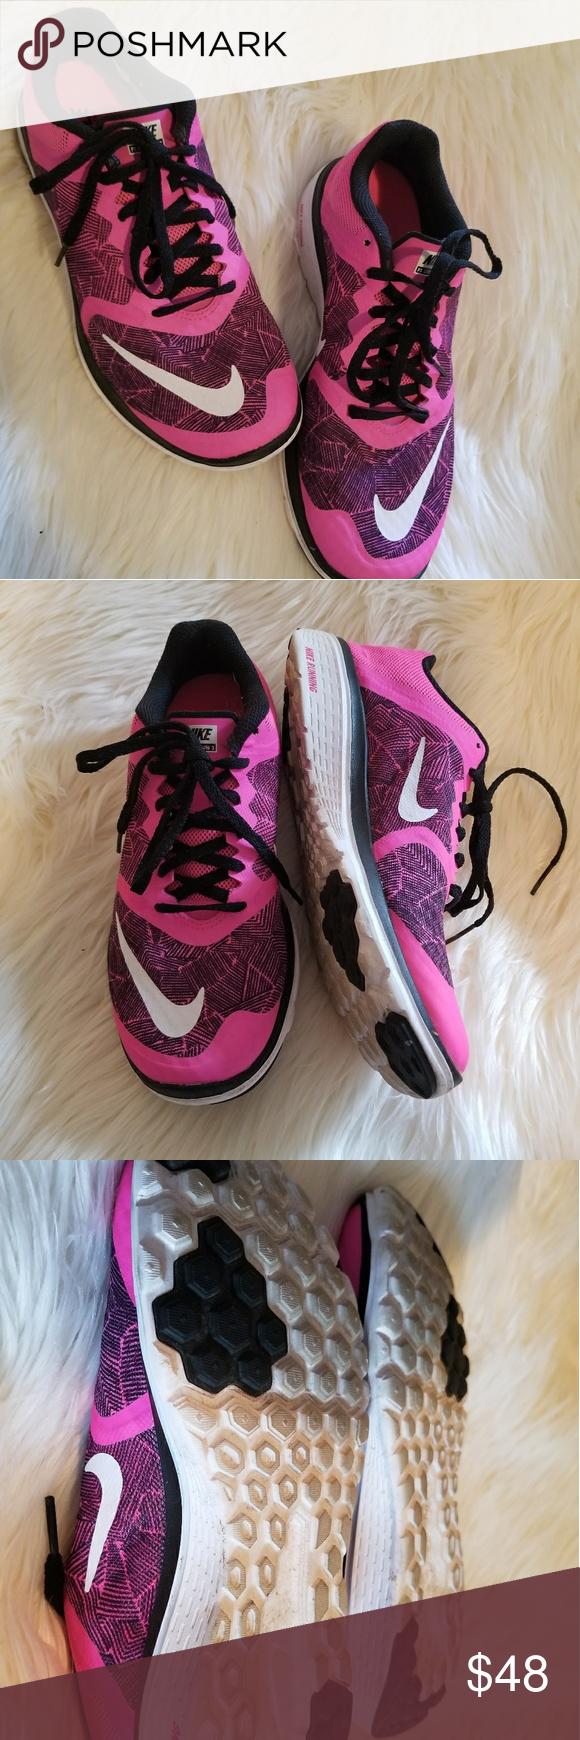 EUC* Nike Fit Sole FS Lite Shoes* EUC* Nike FitSole Shoes